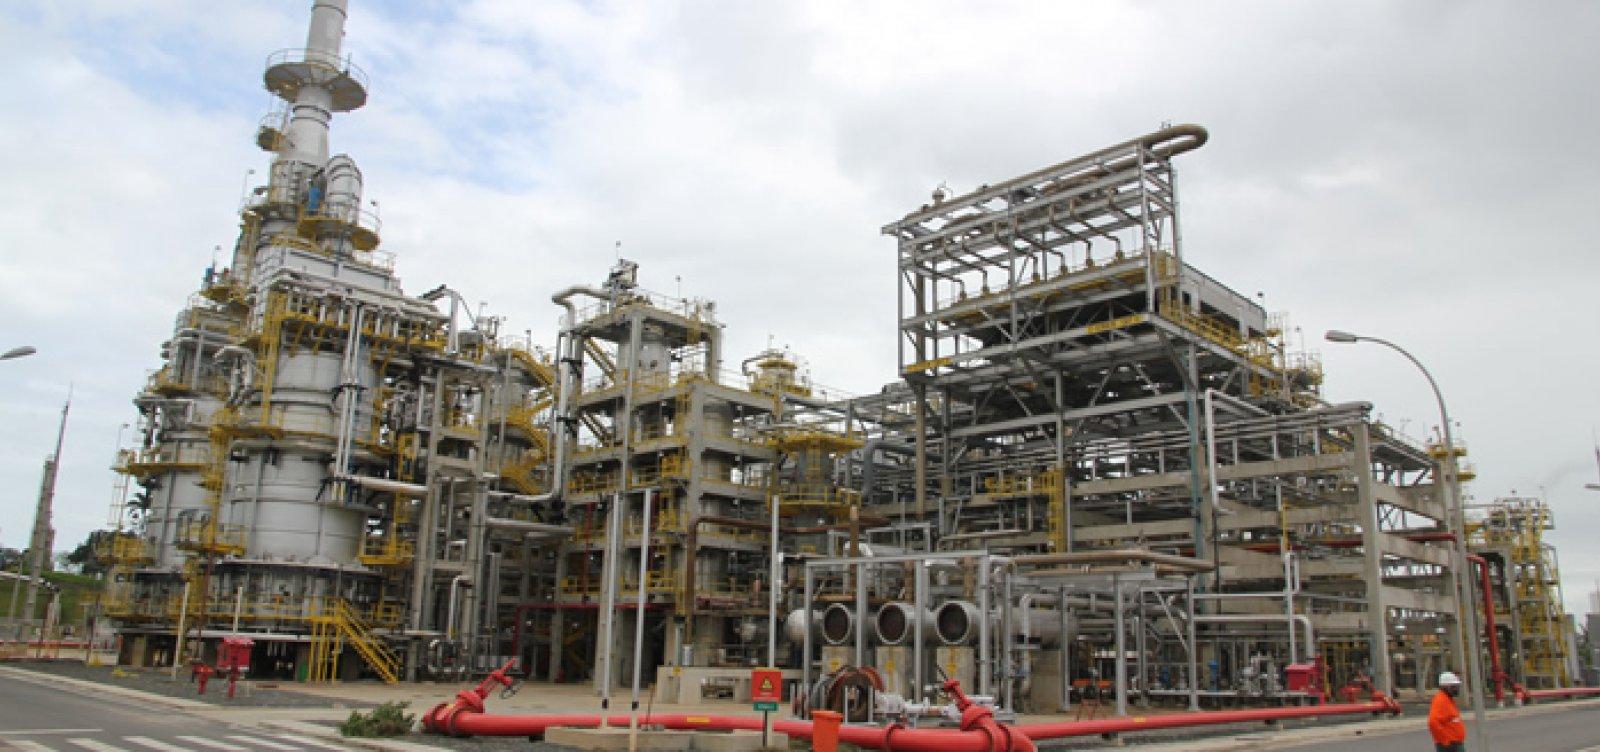 [Petrobras encerrará atividades na Bahia, diz Sindipetro]